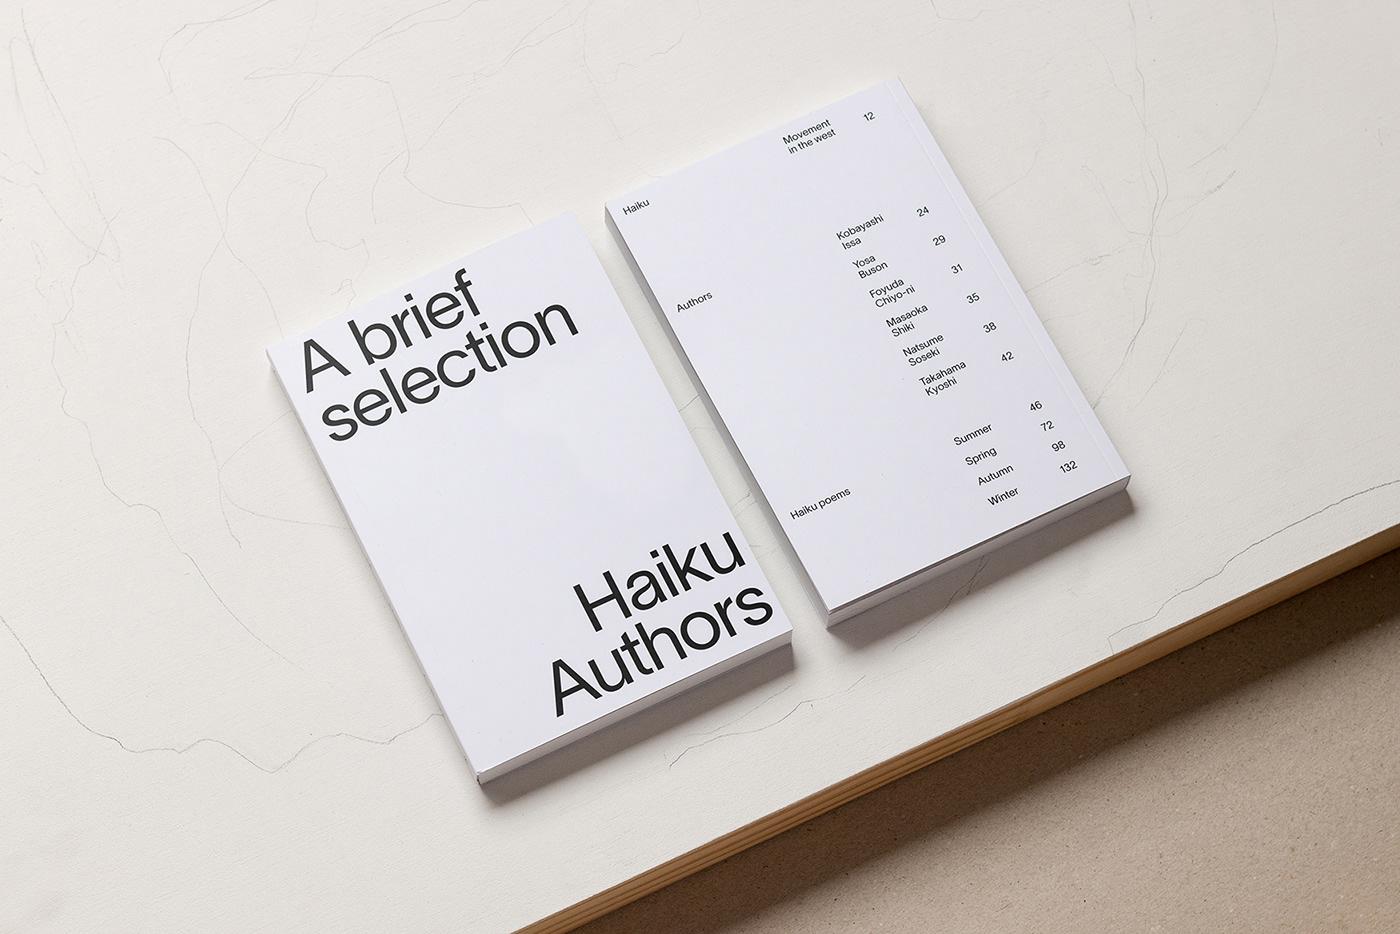 Thumbnail for 'A Brief Selection of Haiku Authors' Keeps It Just As Minimal As Its Namesake